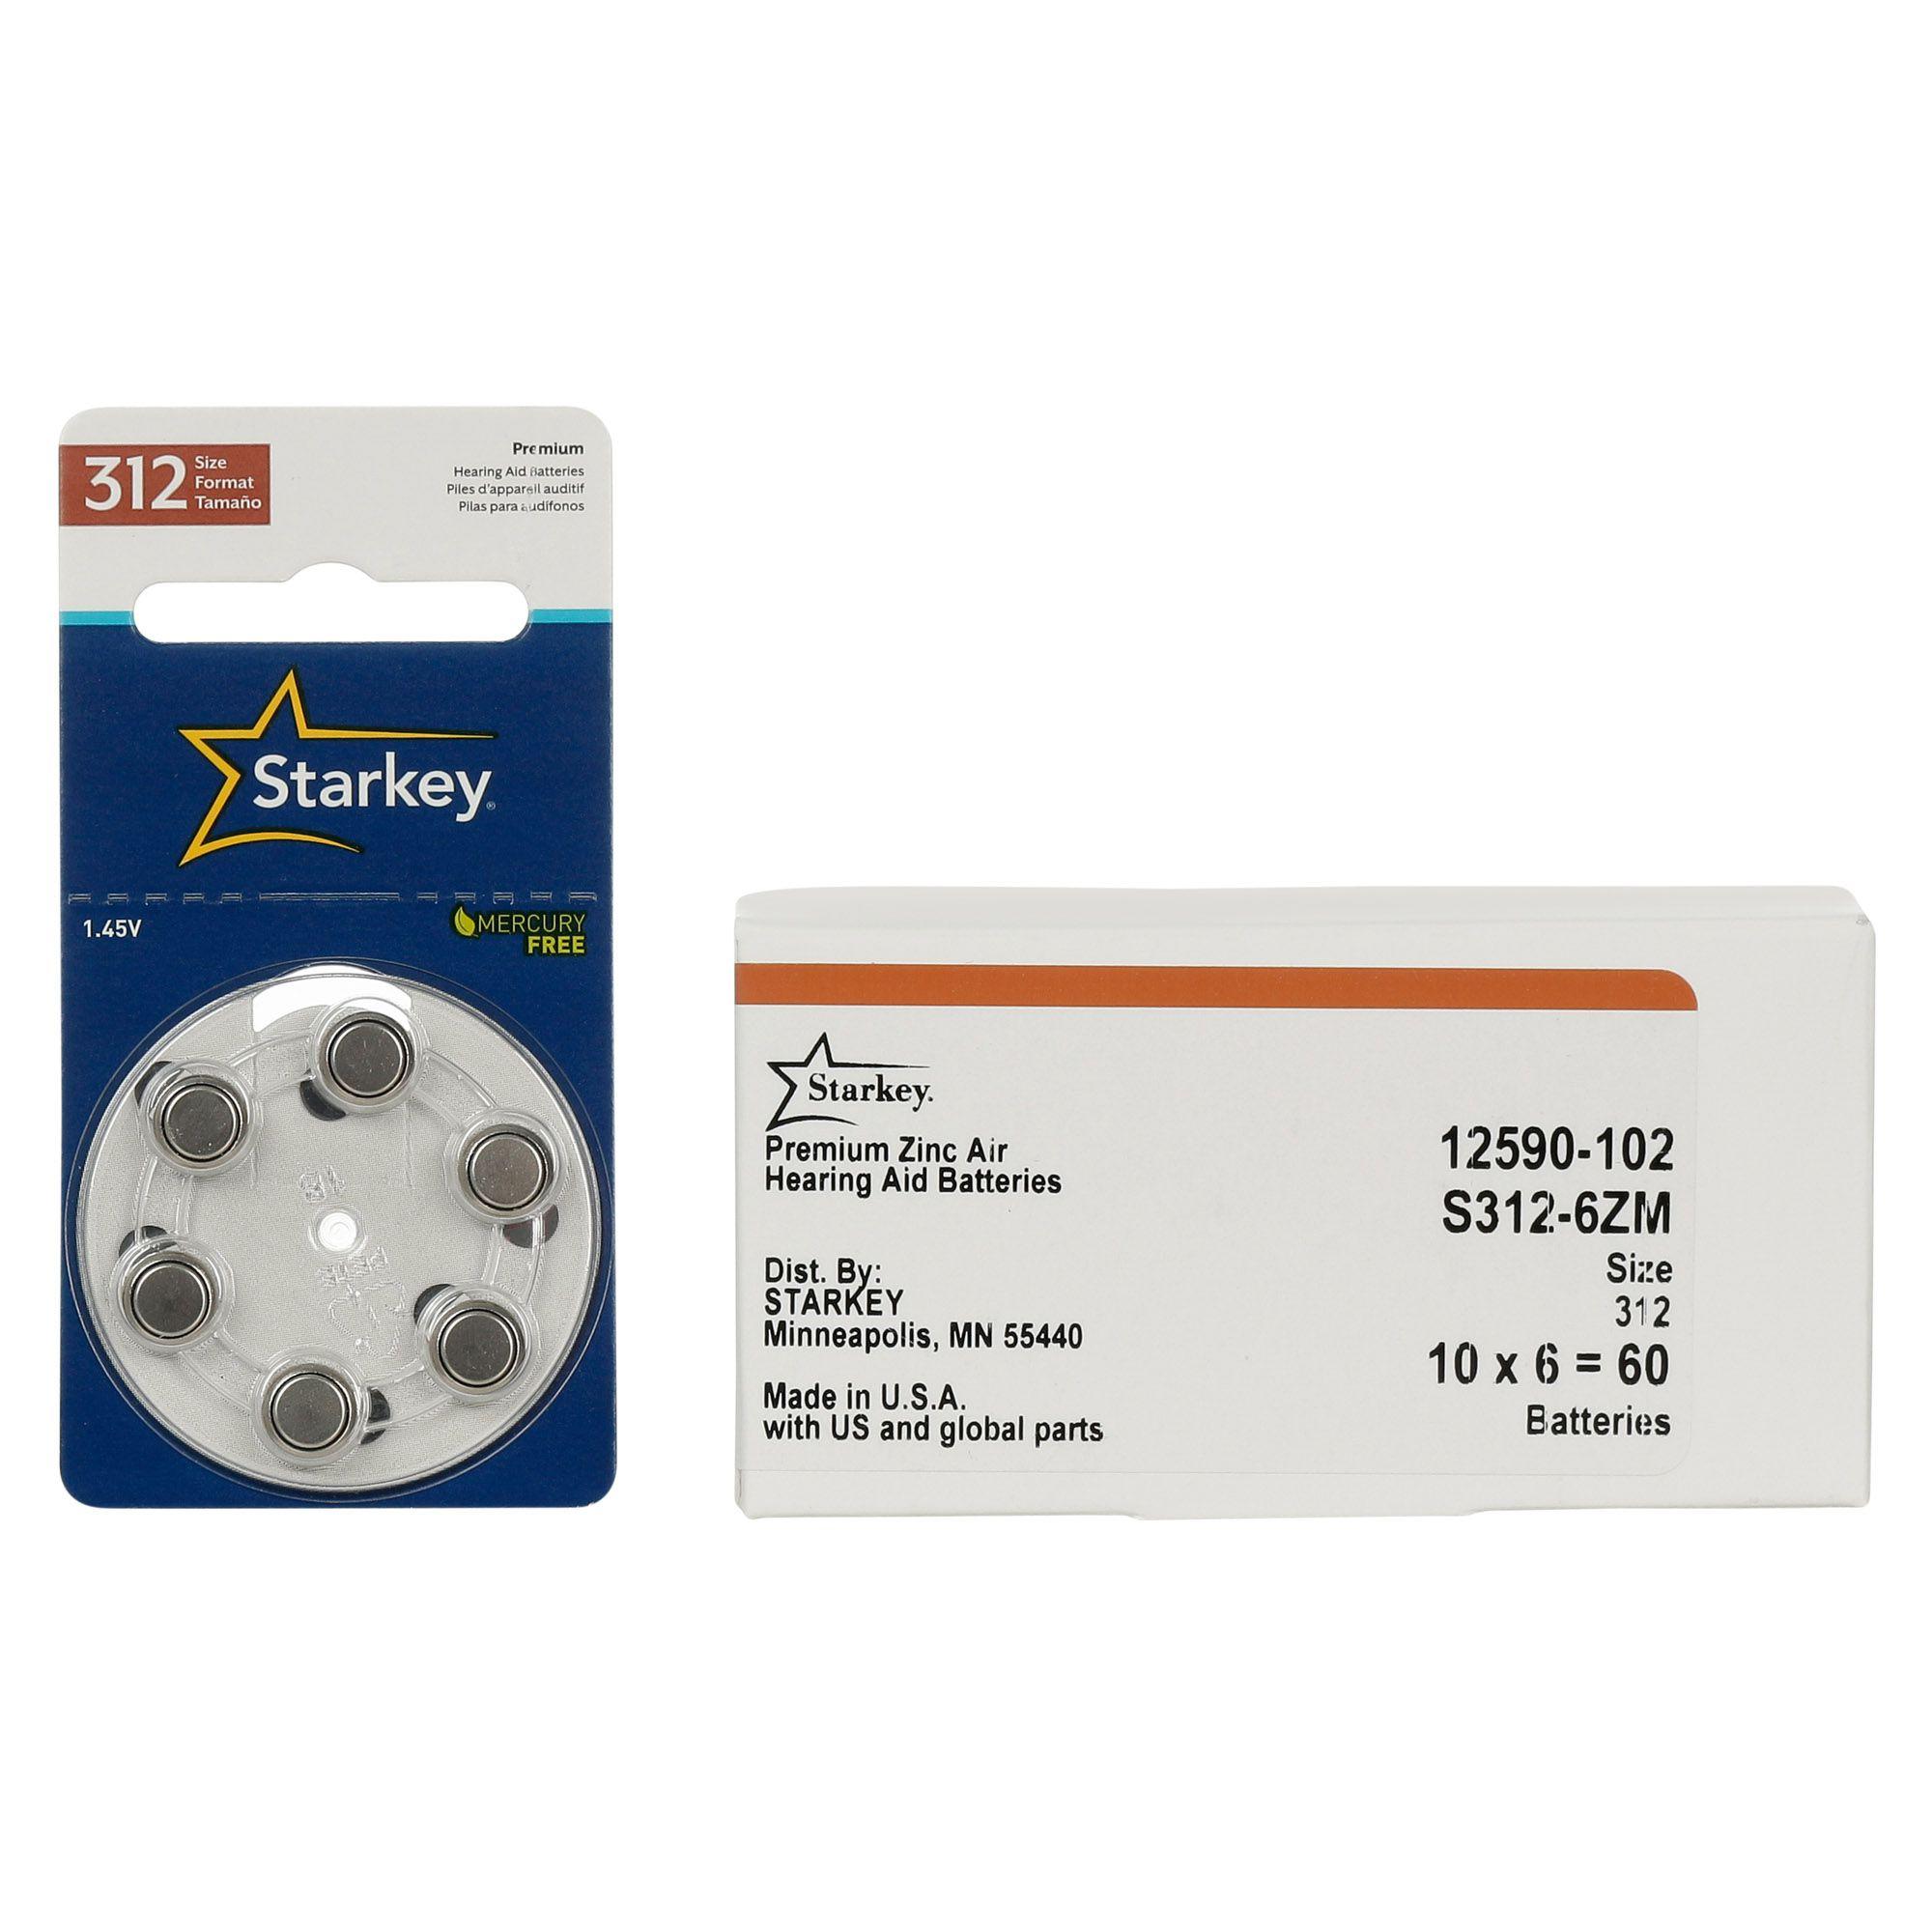 Starkey S312 / PR41 - 10 Cartelas - 60 Baterias para Aparelho Auditivo